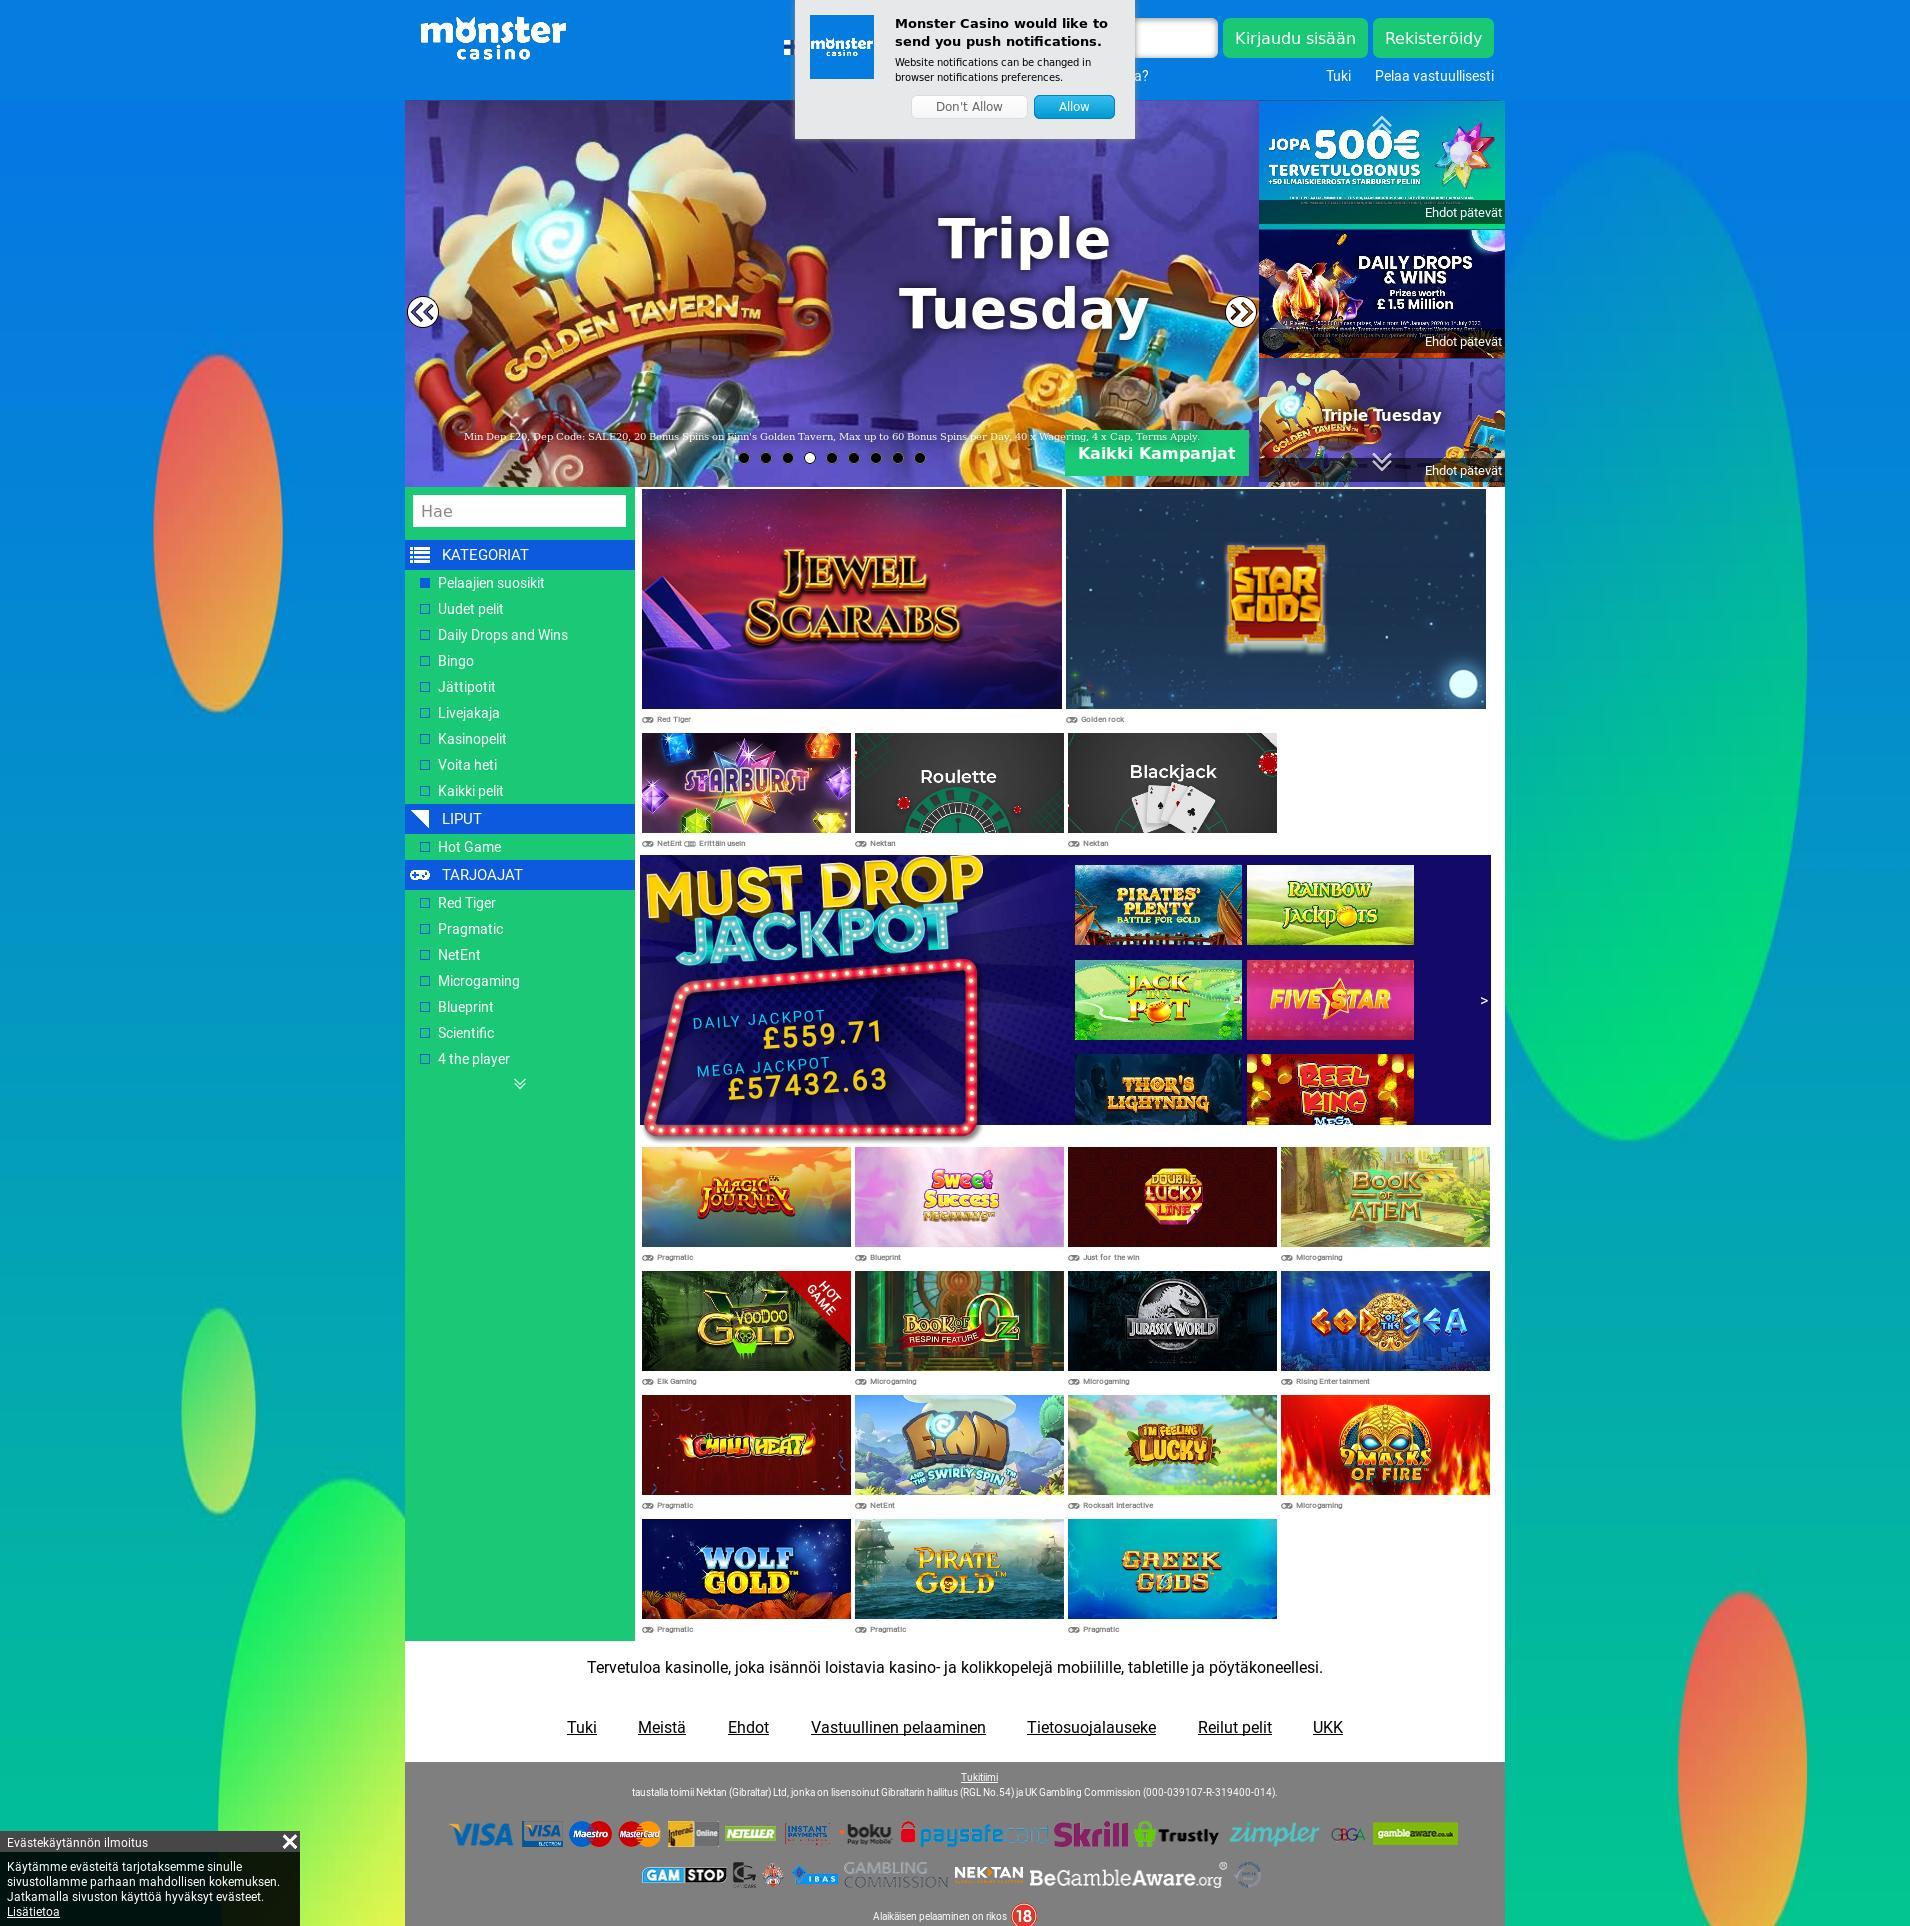 Casino screen Lobby 2020-01-21 for Finland